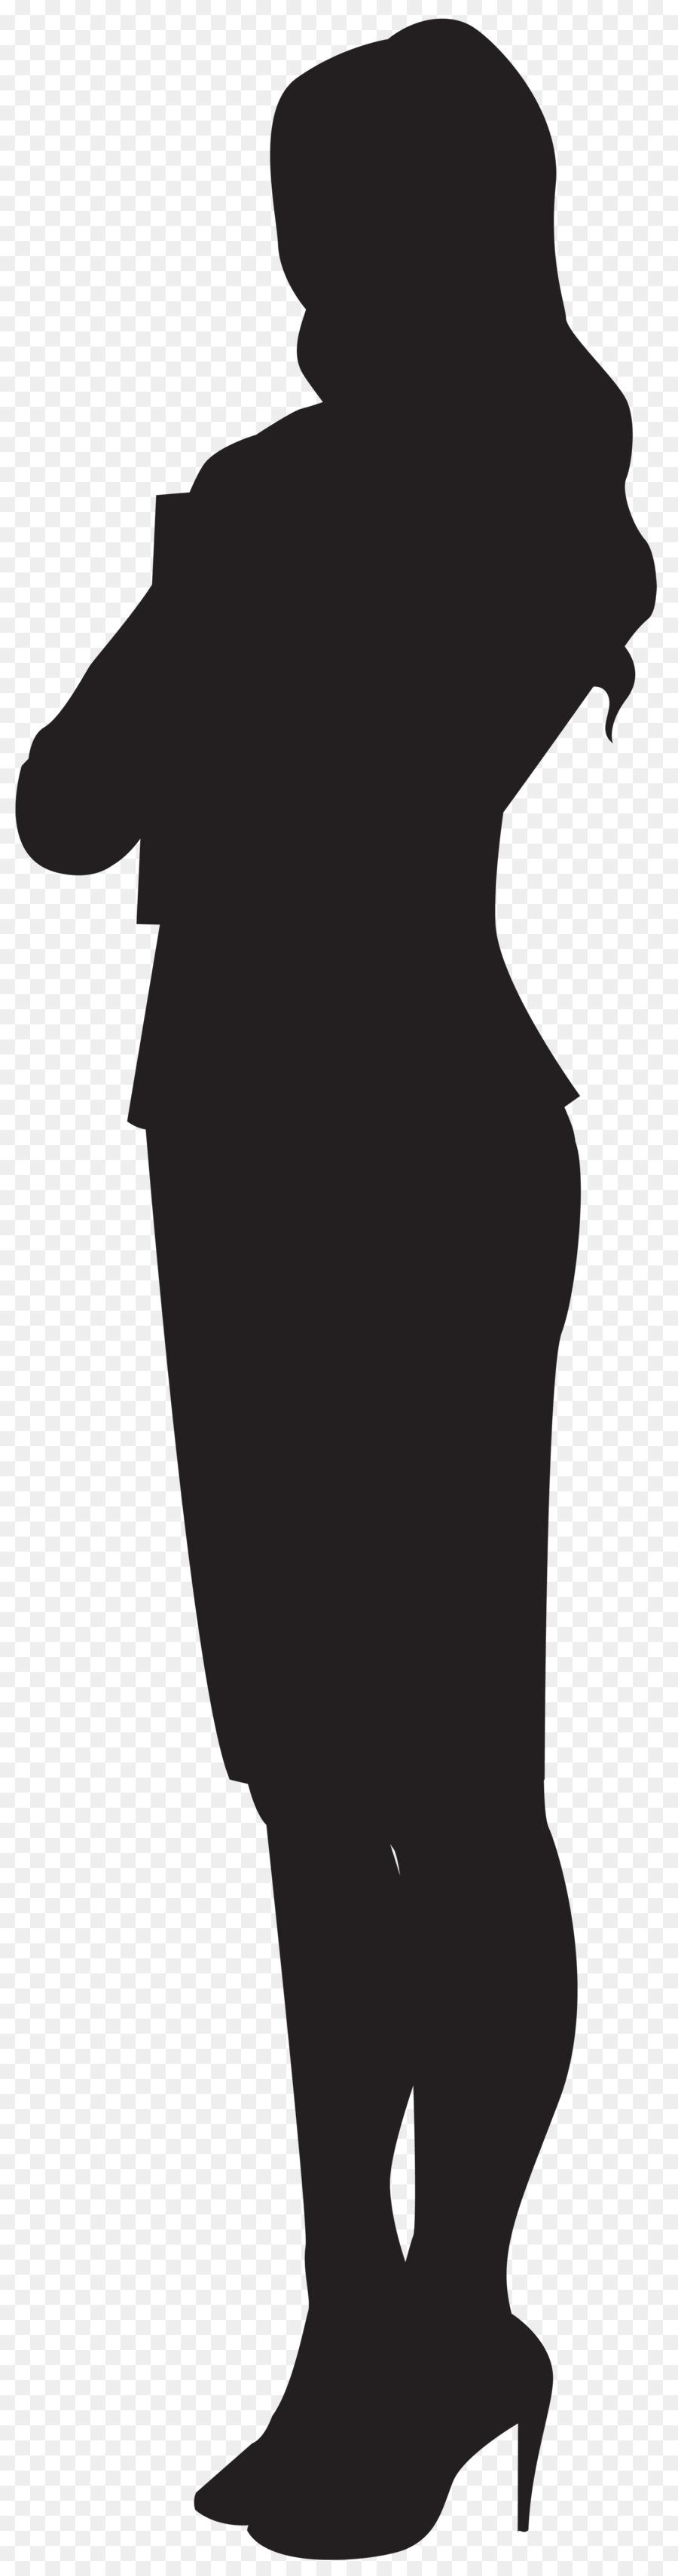 900x3420 Silhouette Woman Clip Art